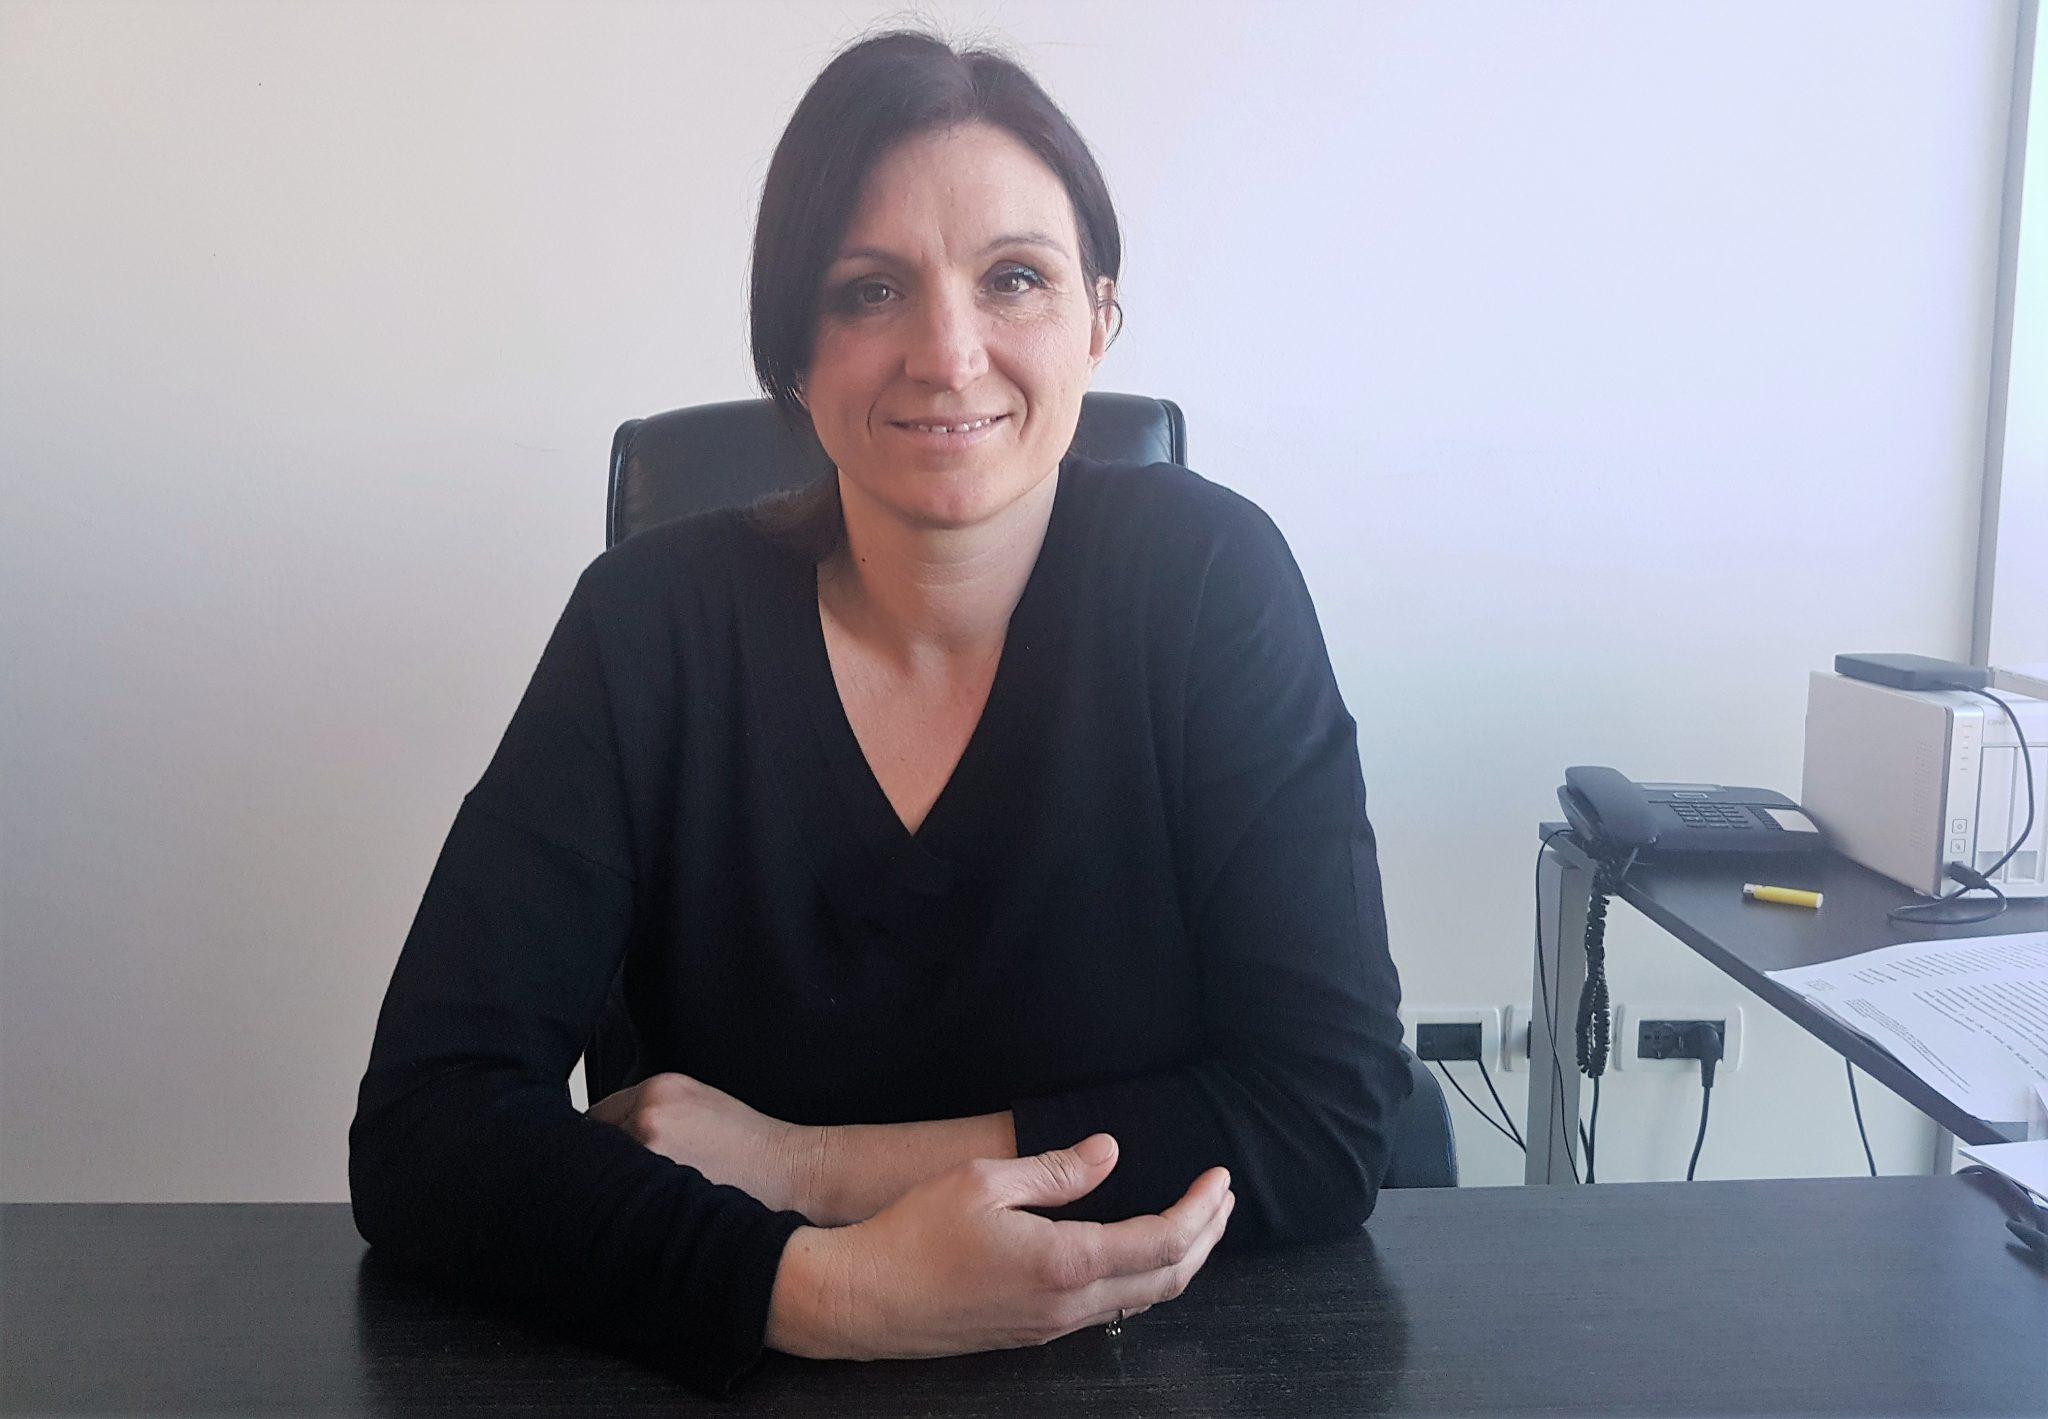 Stefania Suzzi, imprenditrice e atleta romagnola